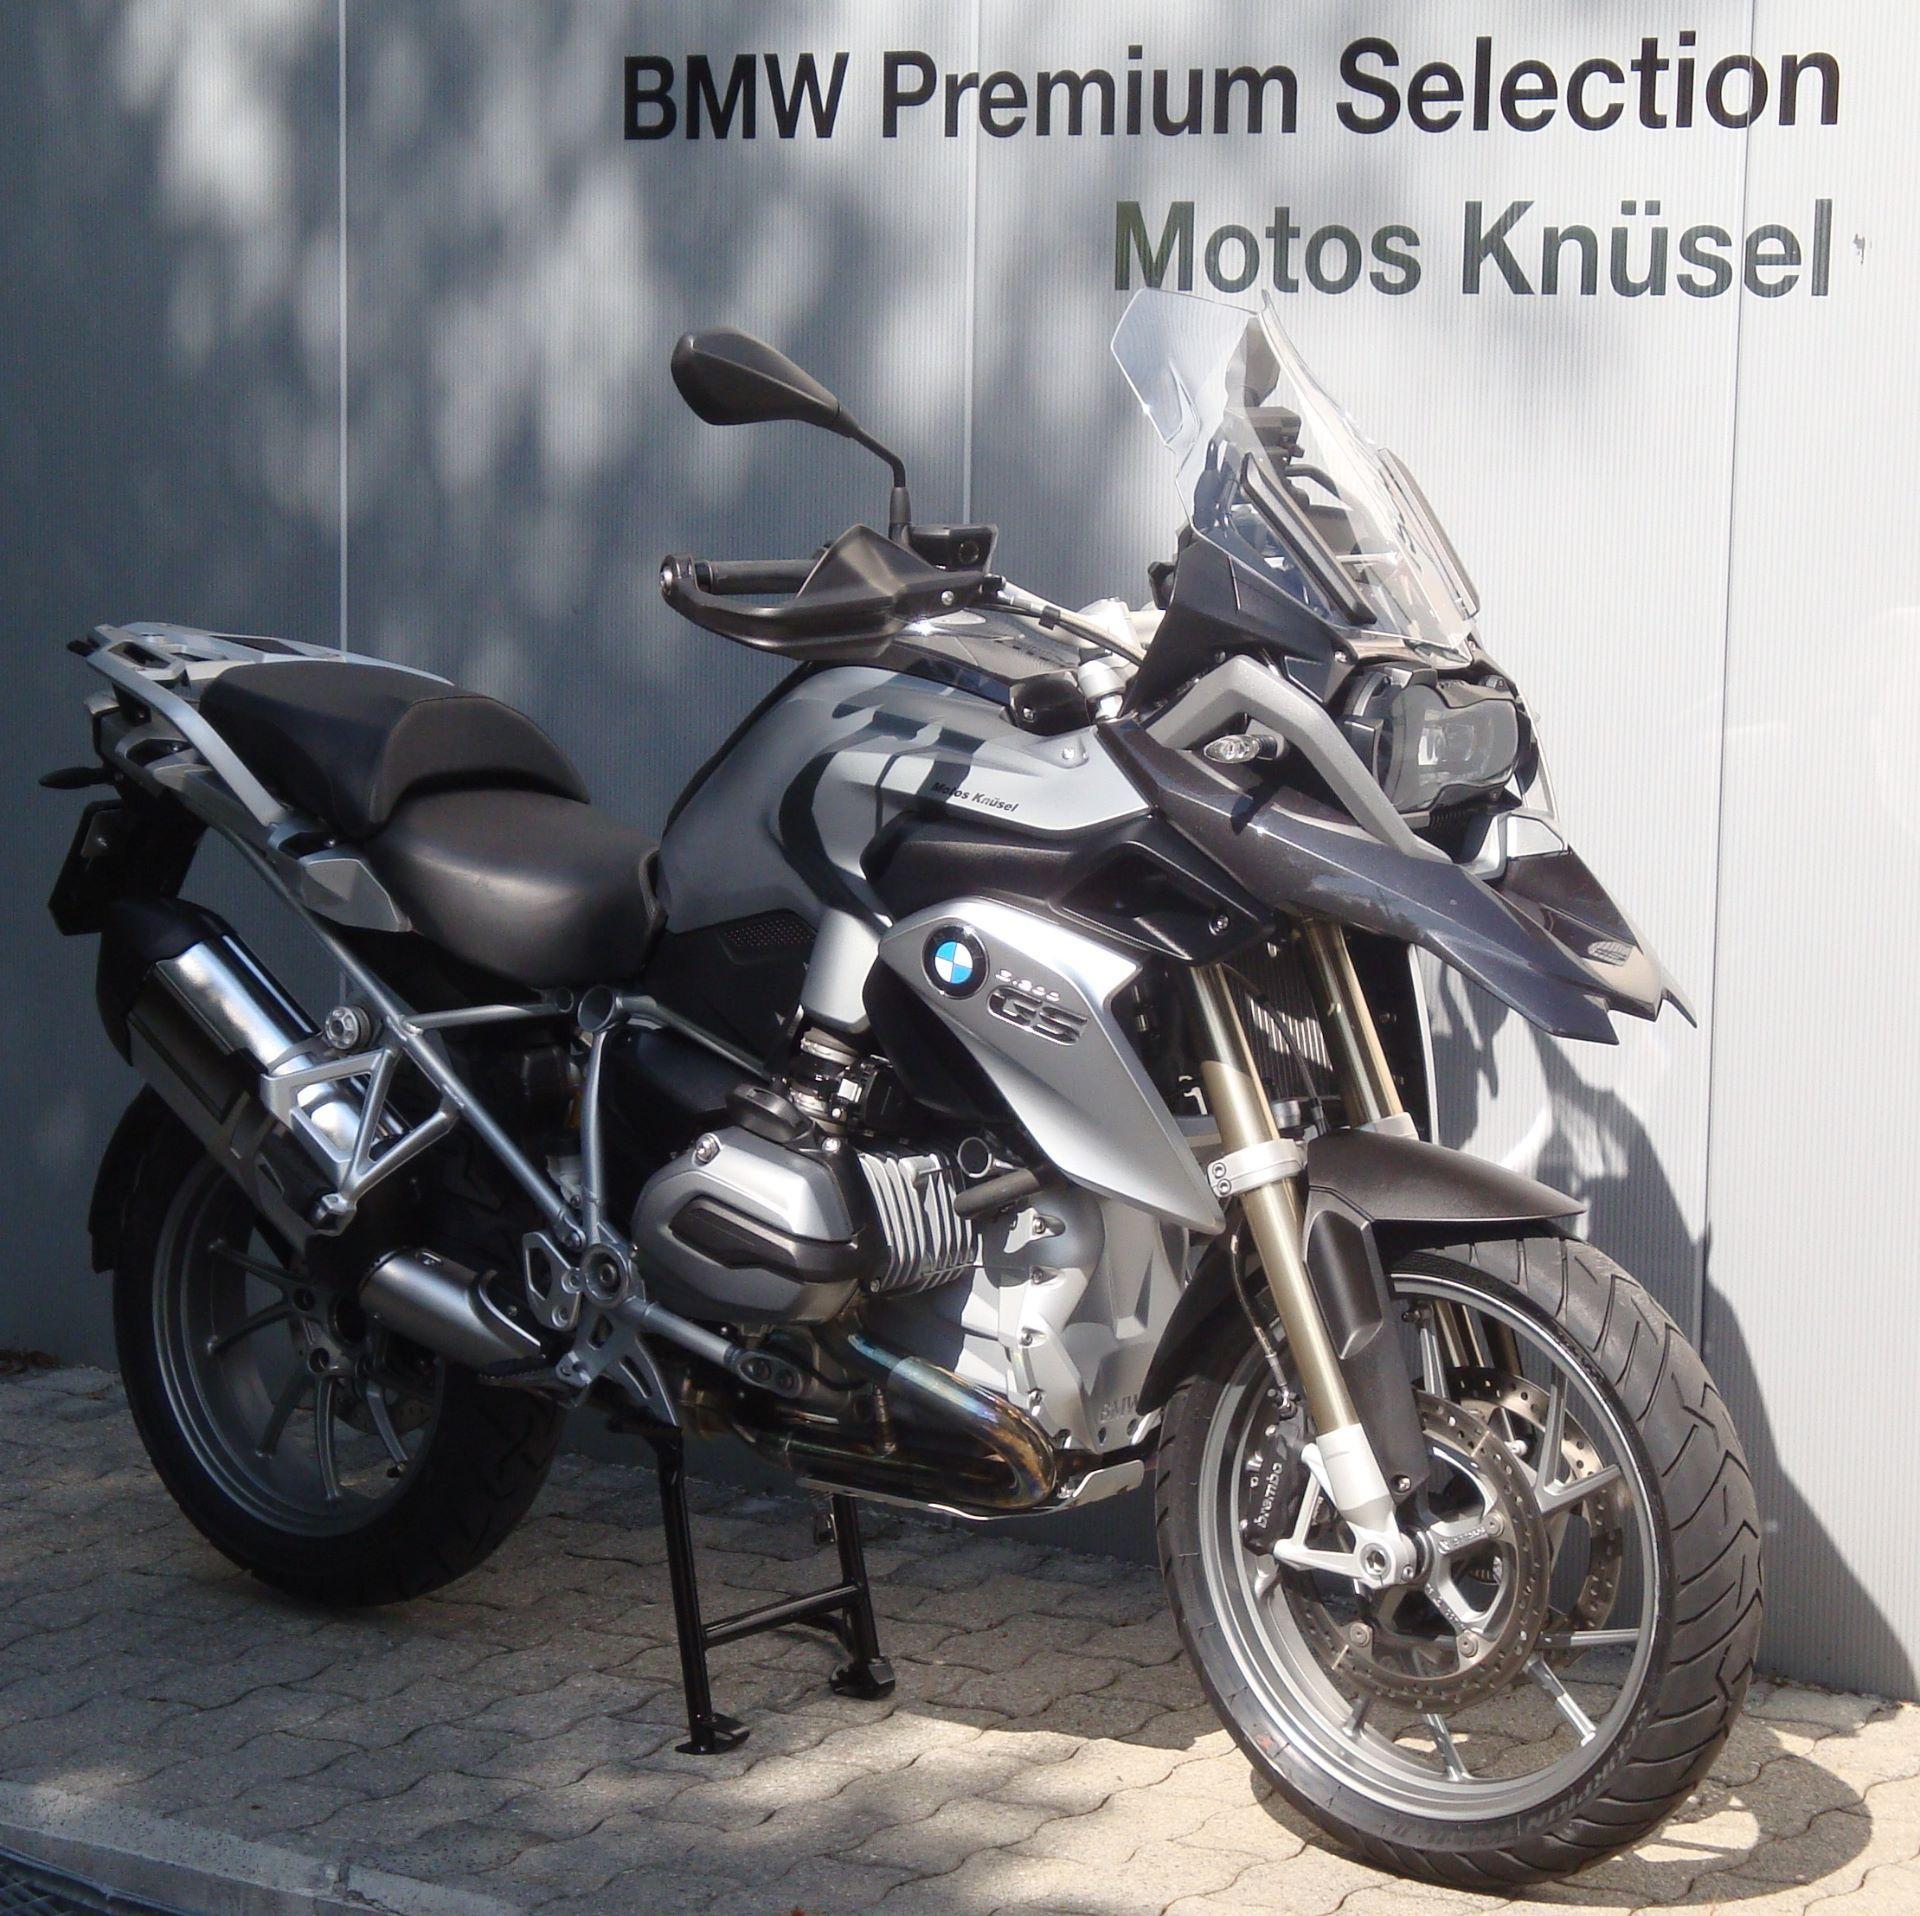 moto occasions acheter bmw r 1200 gs abs motos kn sel gmbh ebnet entlebuch. Black Bedroom Furniture Sets. Home Design Ideas